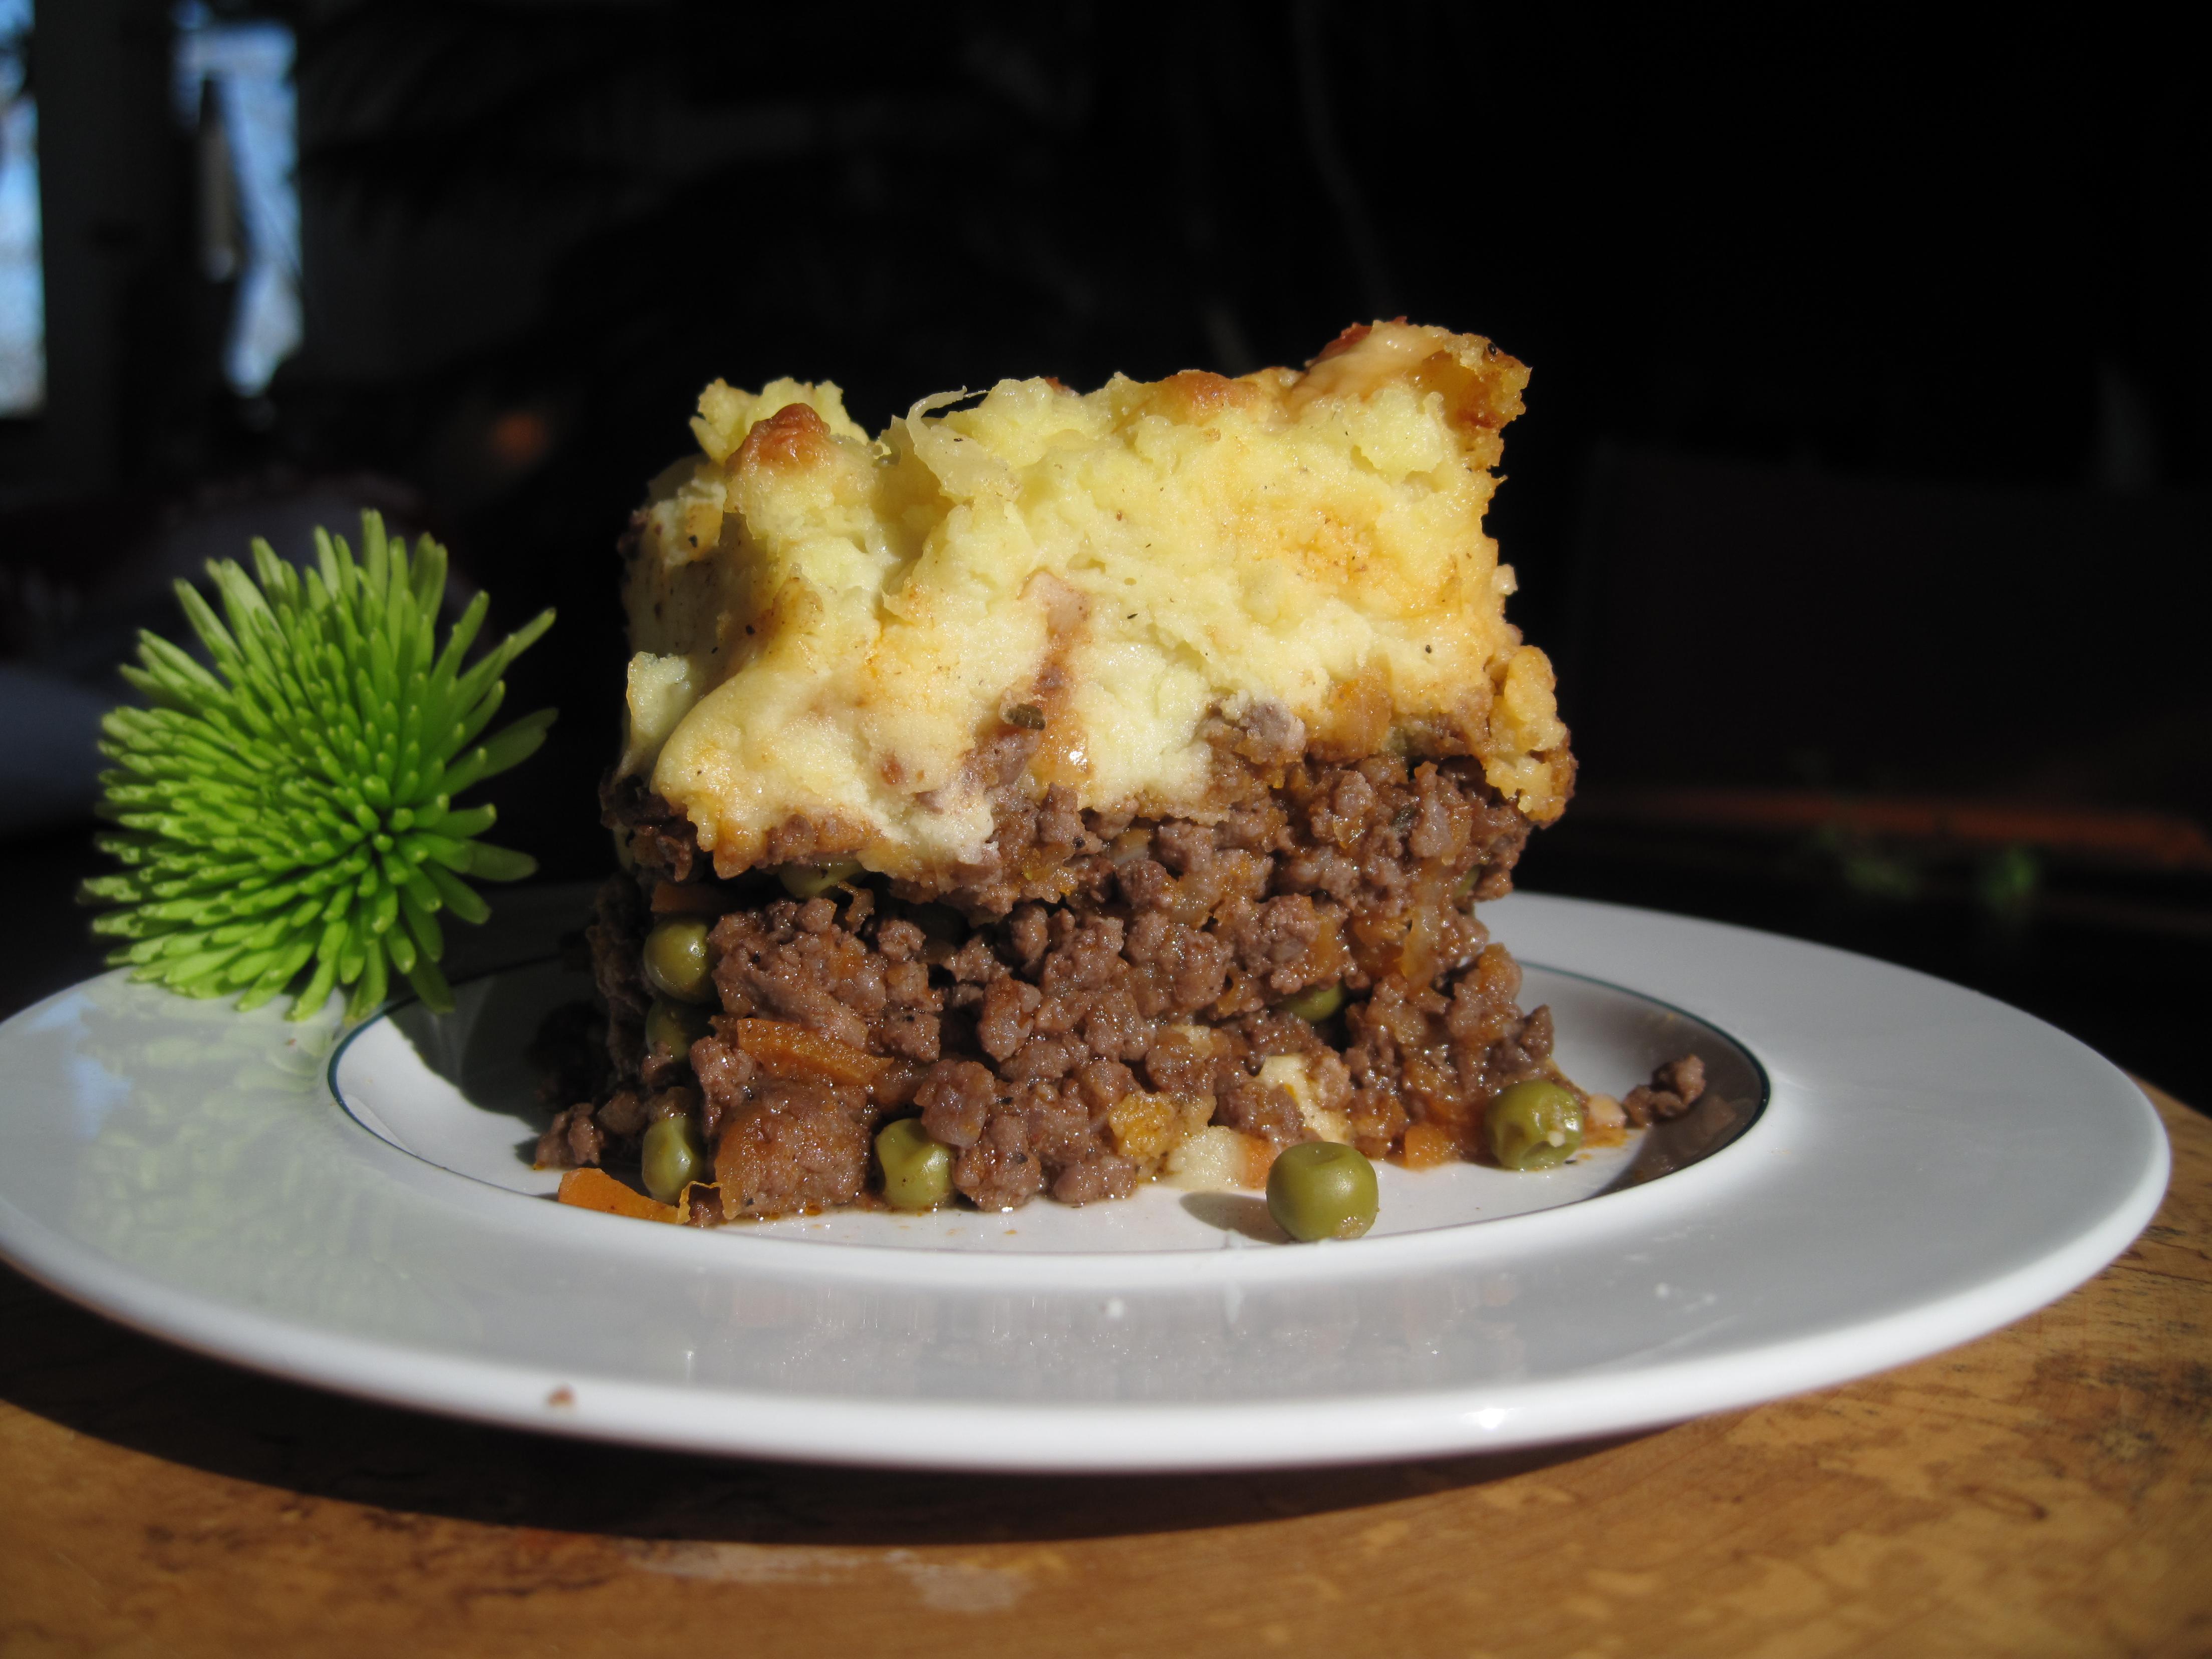 Shepherds pie lea jay enjoy forumfinder Images